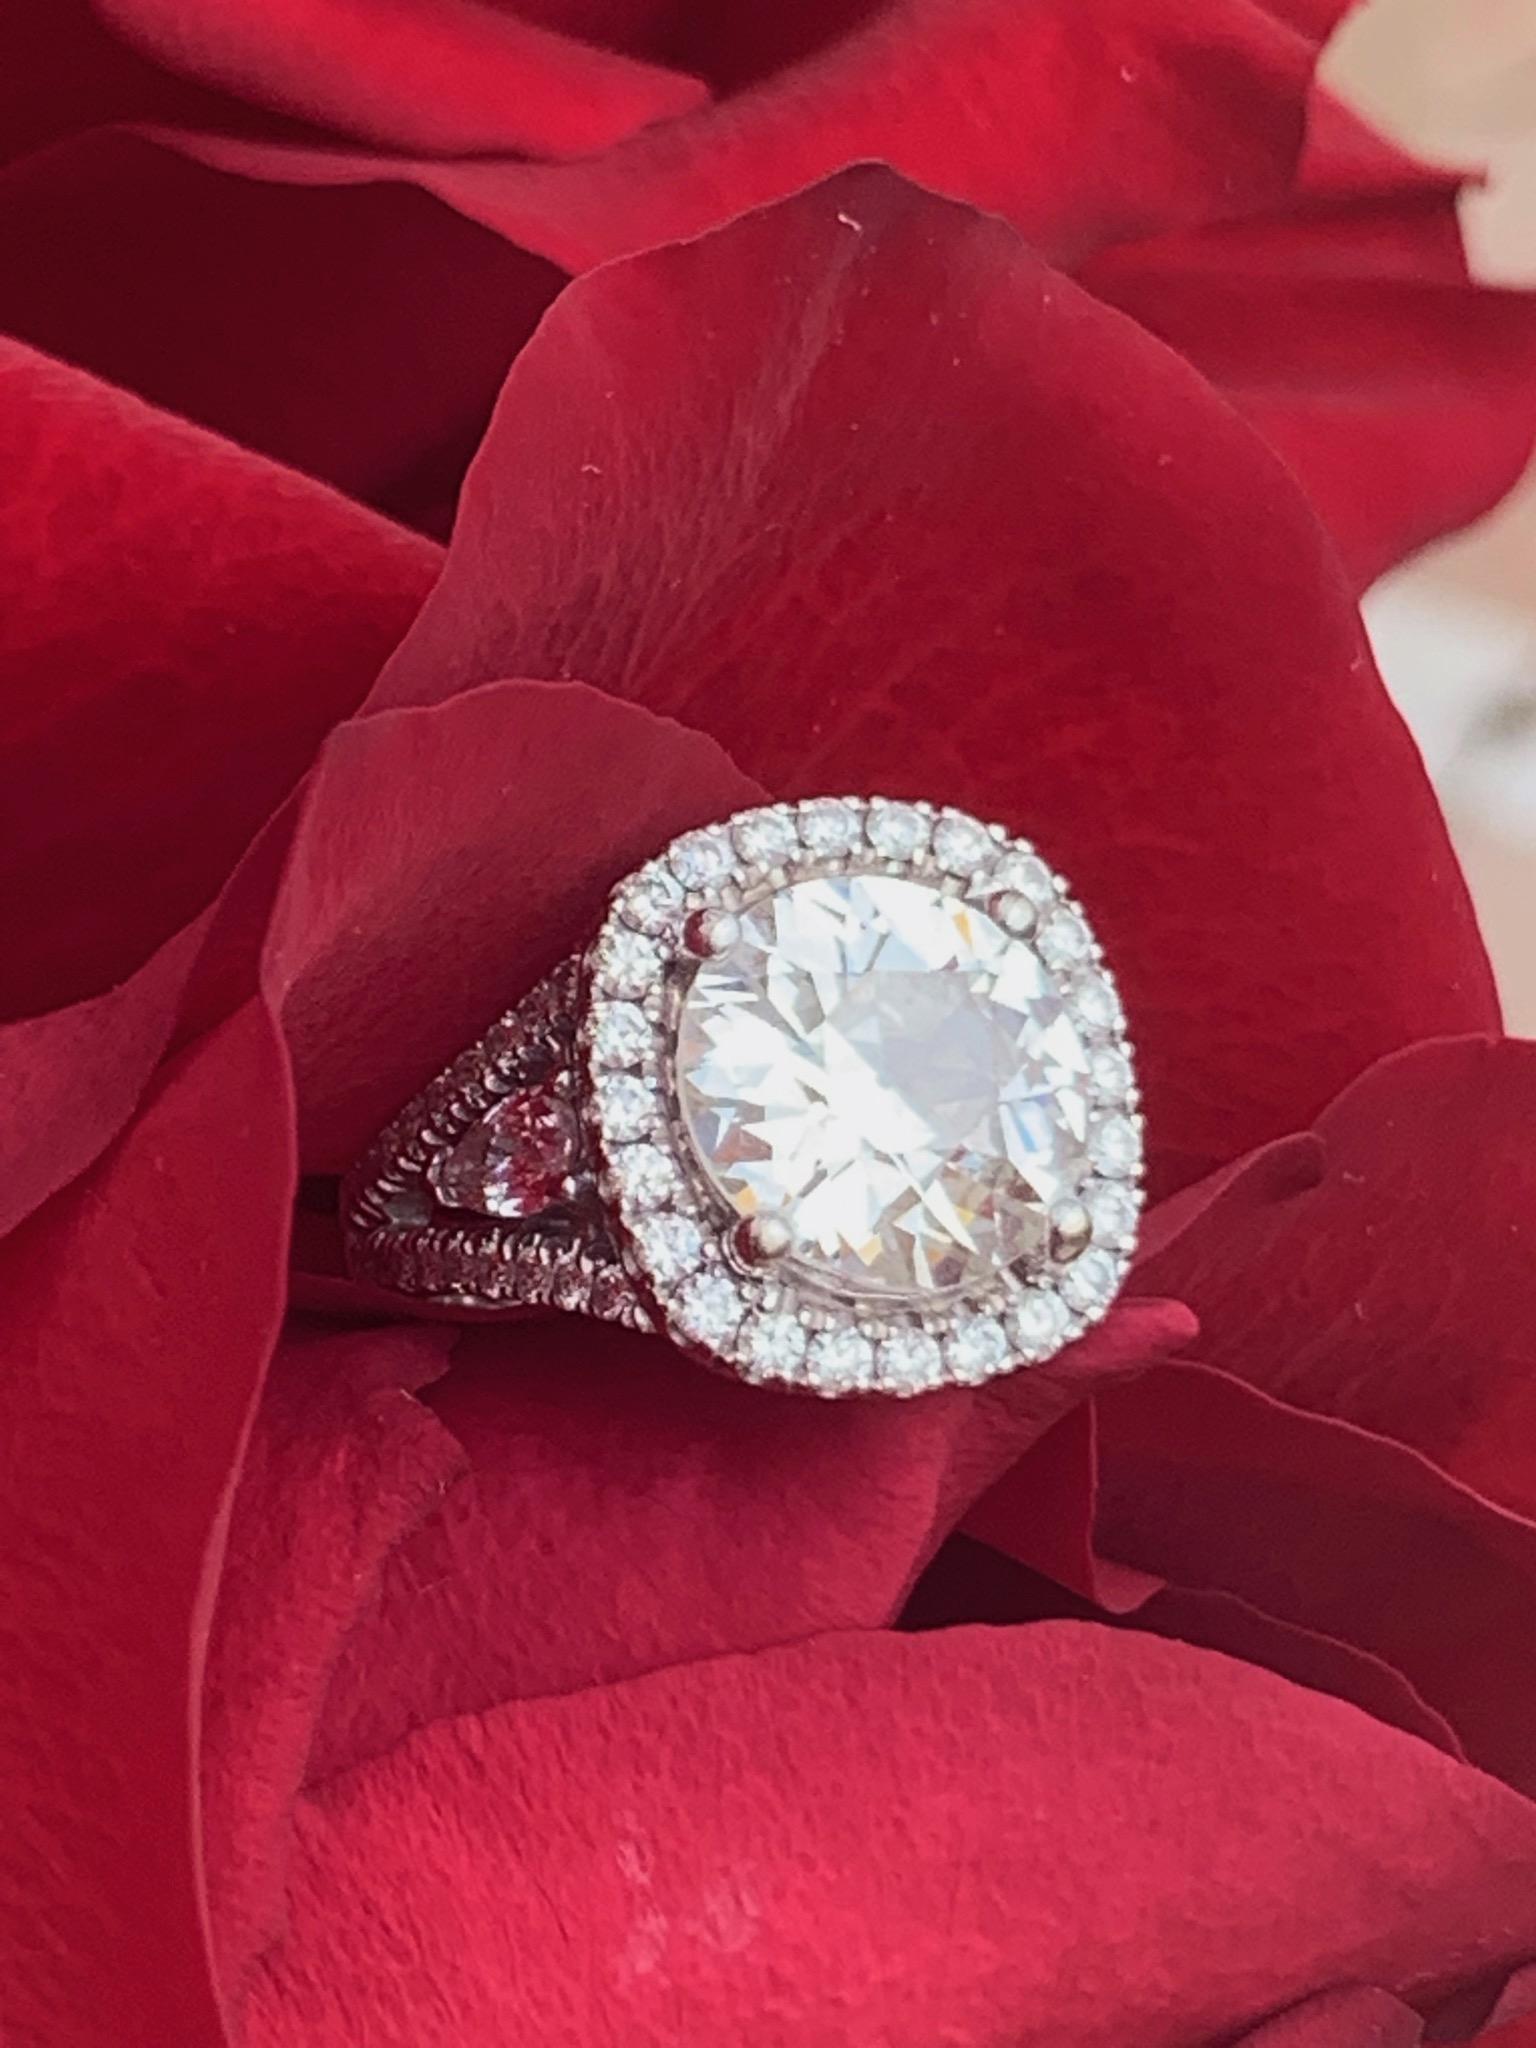 4.4 carat old cushion cut diamond ring